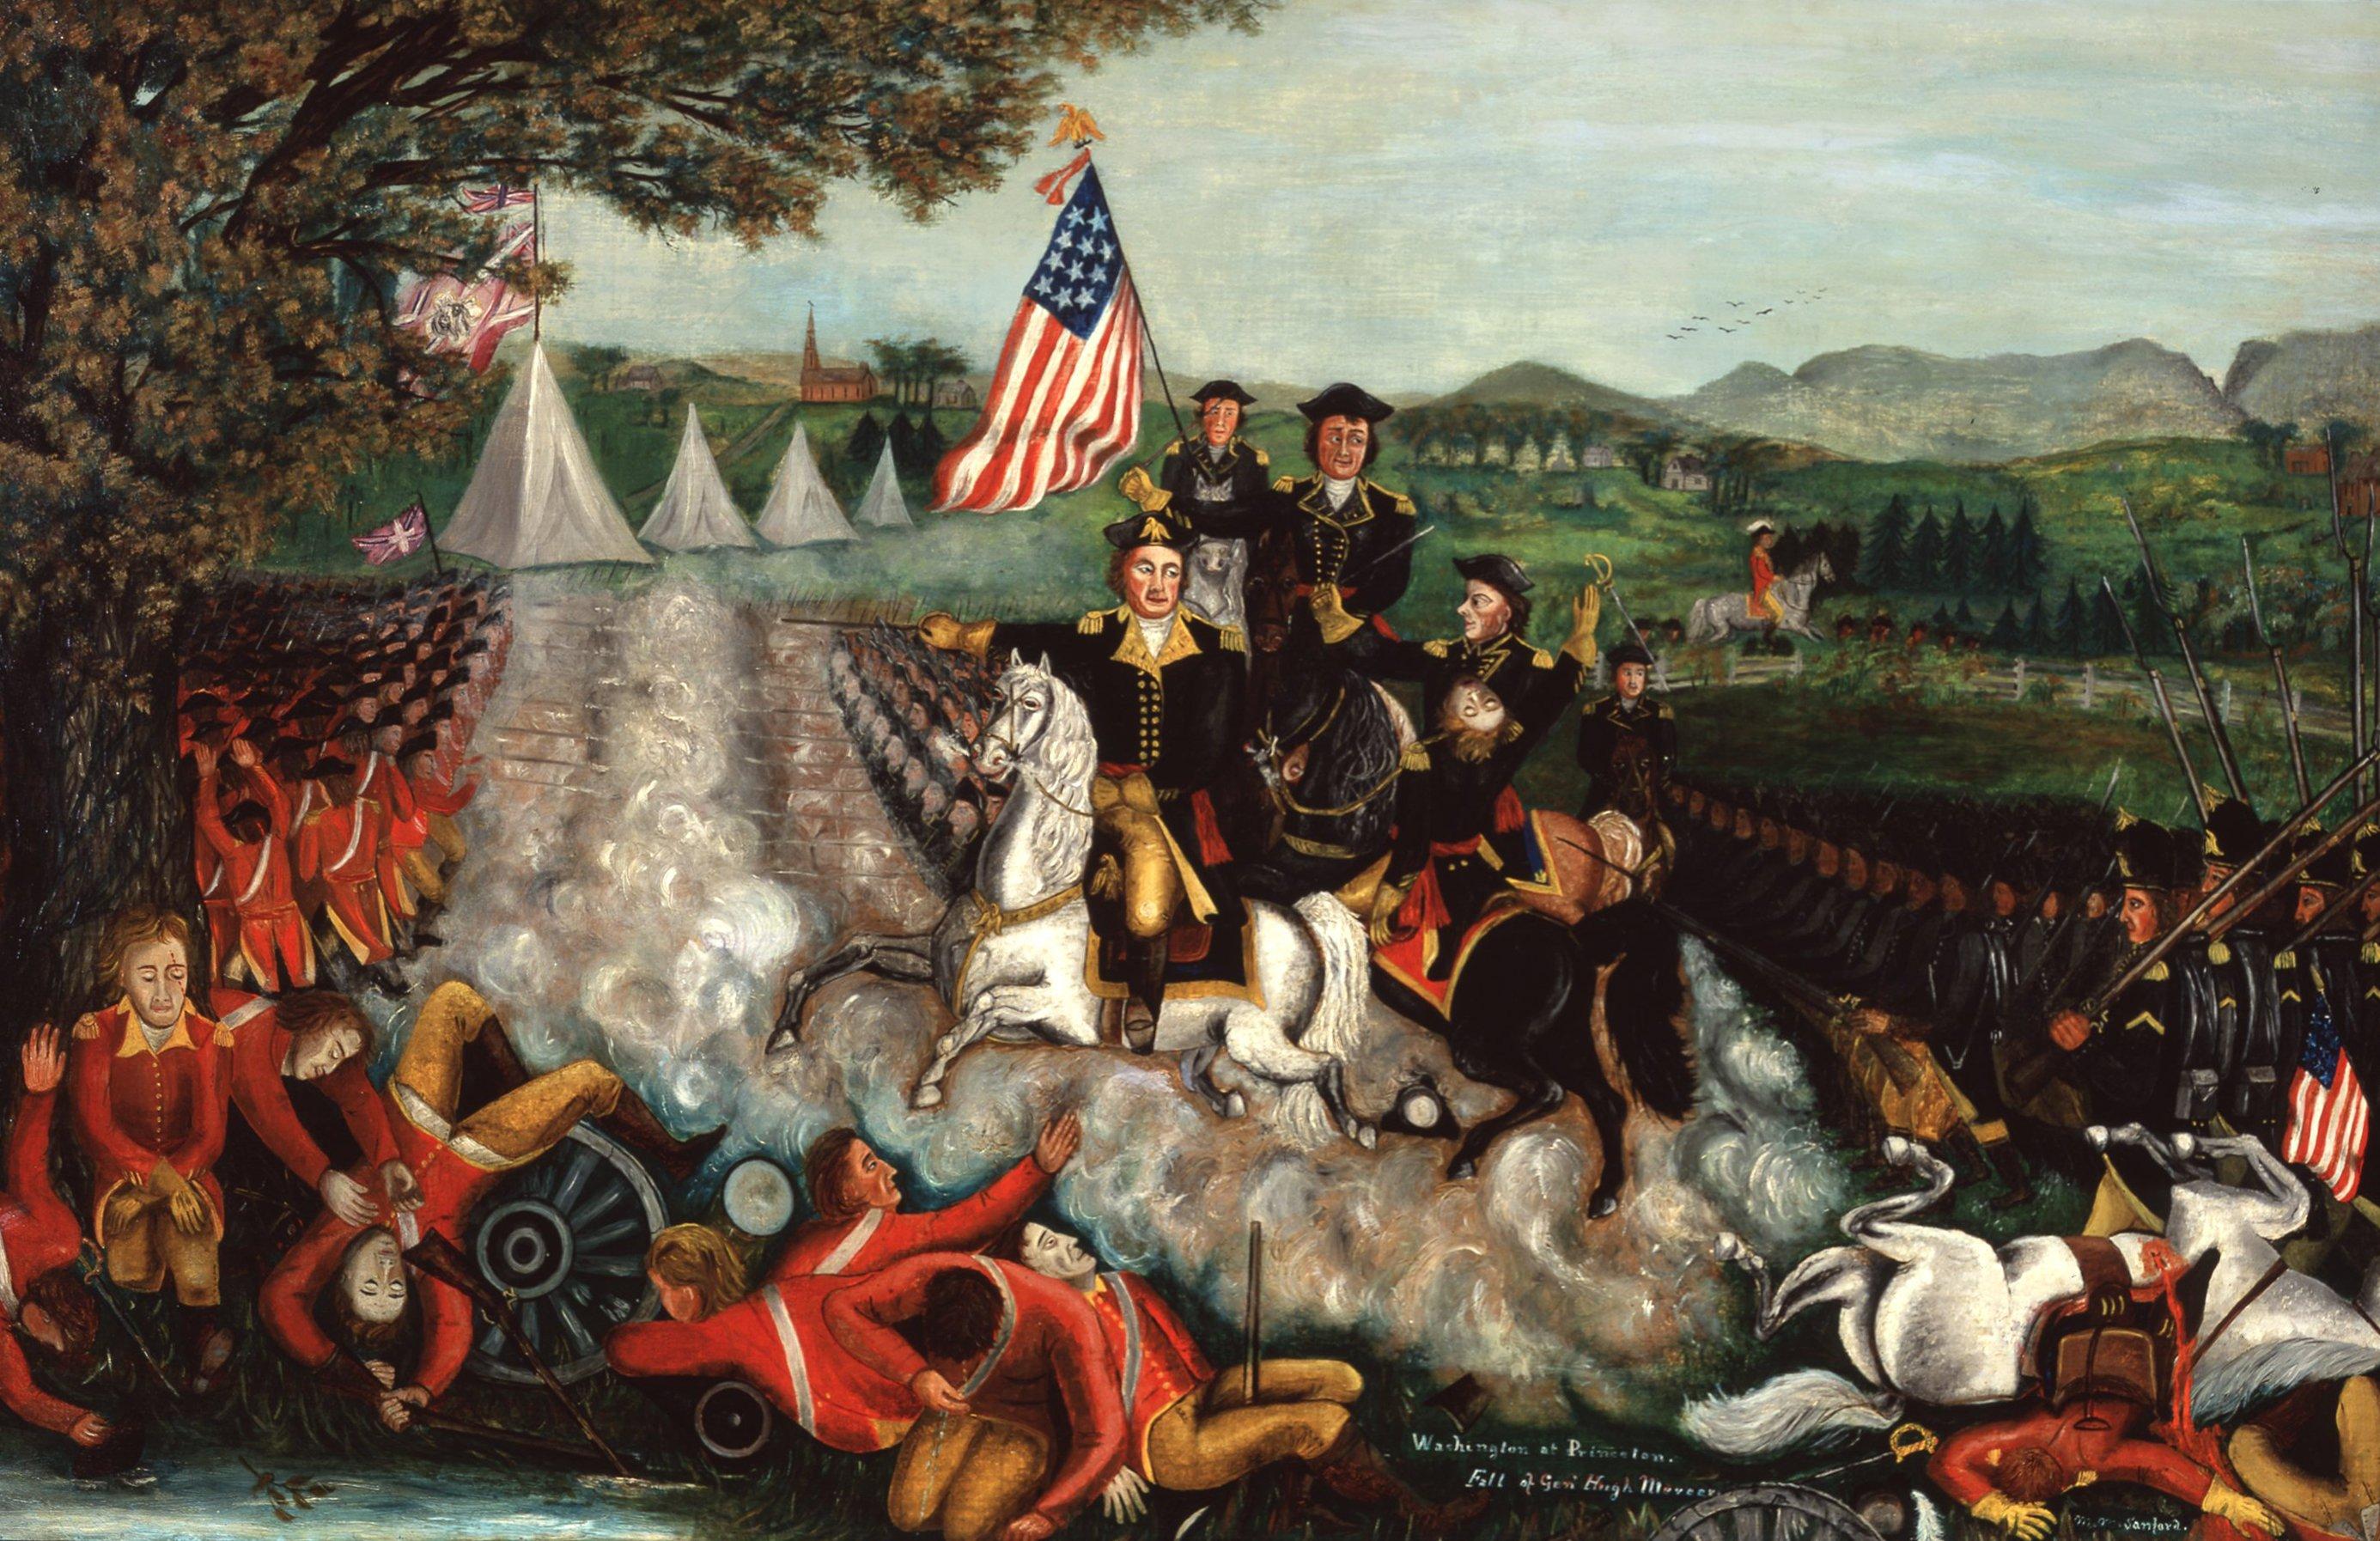 Washington at Princeton, Fall of General Hugh Mercer